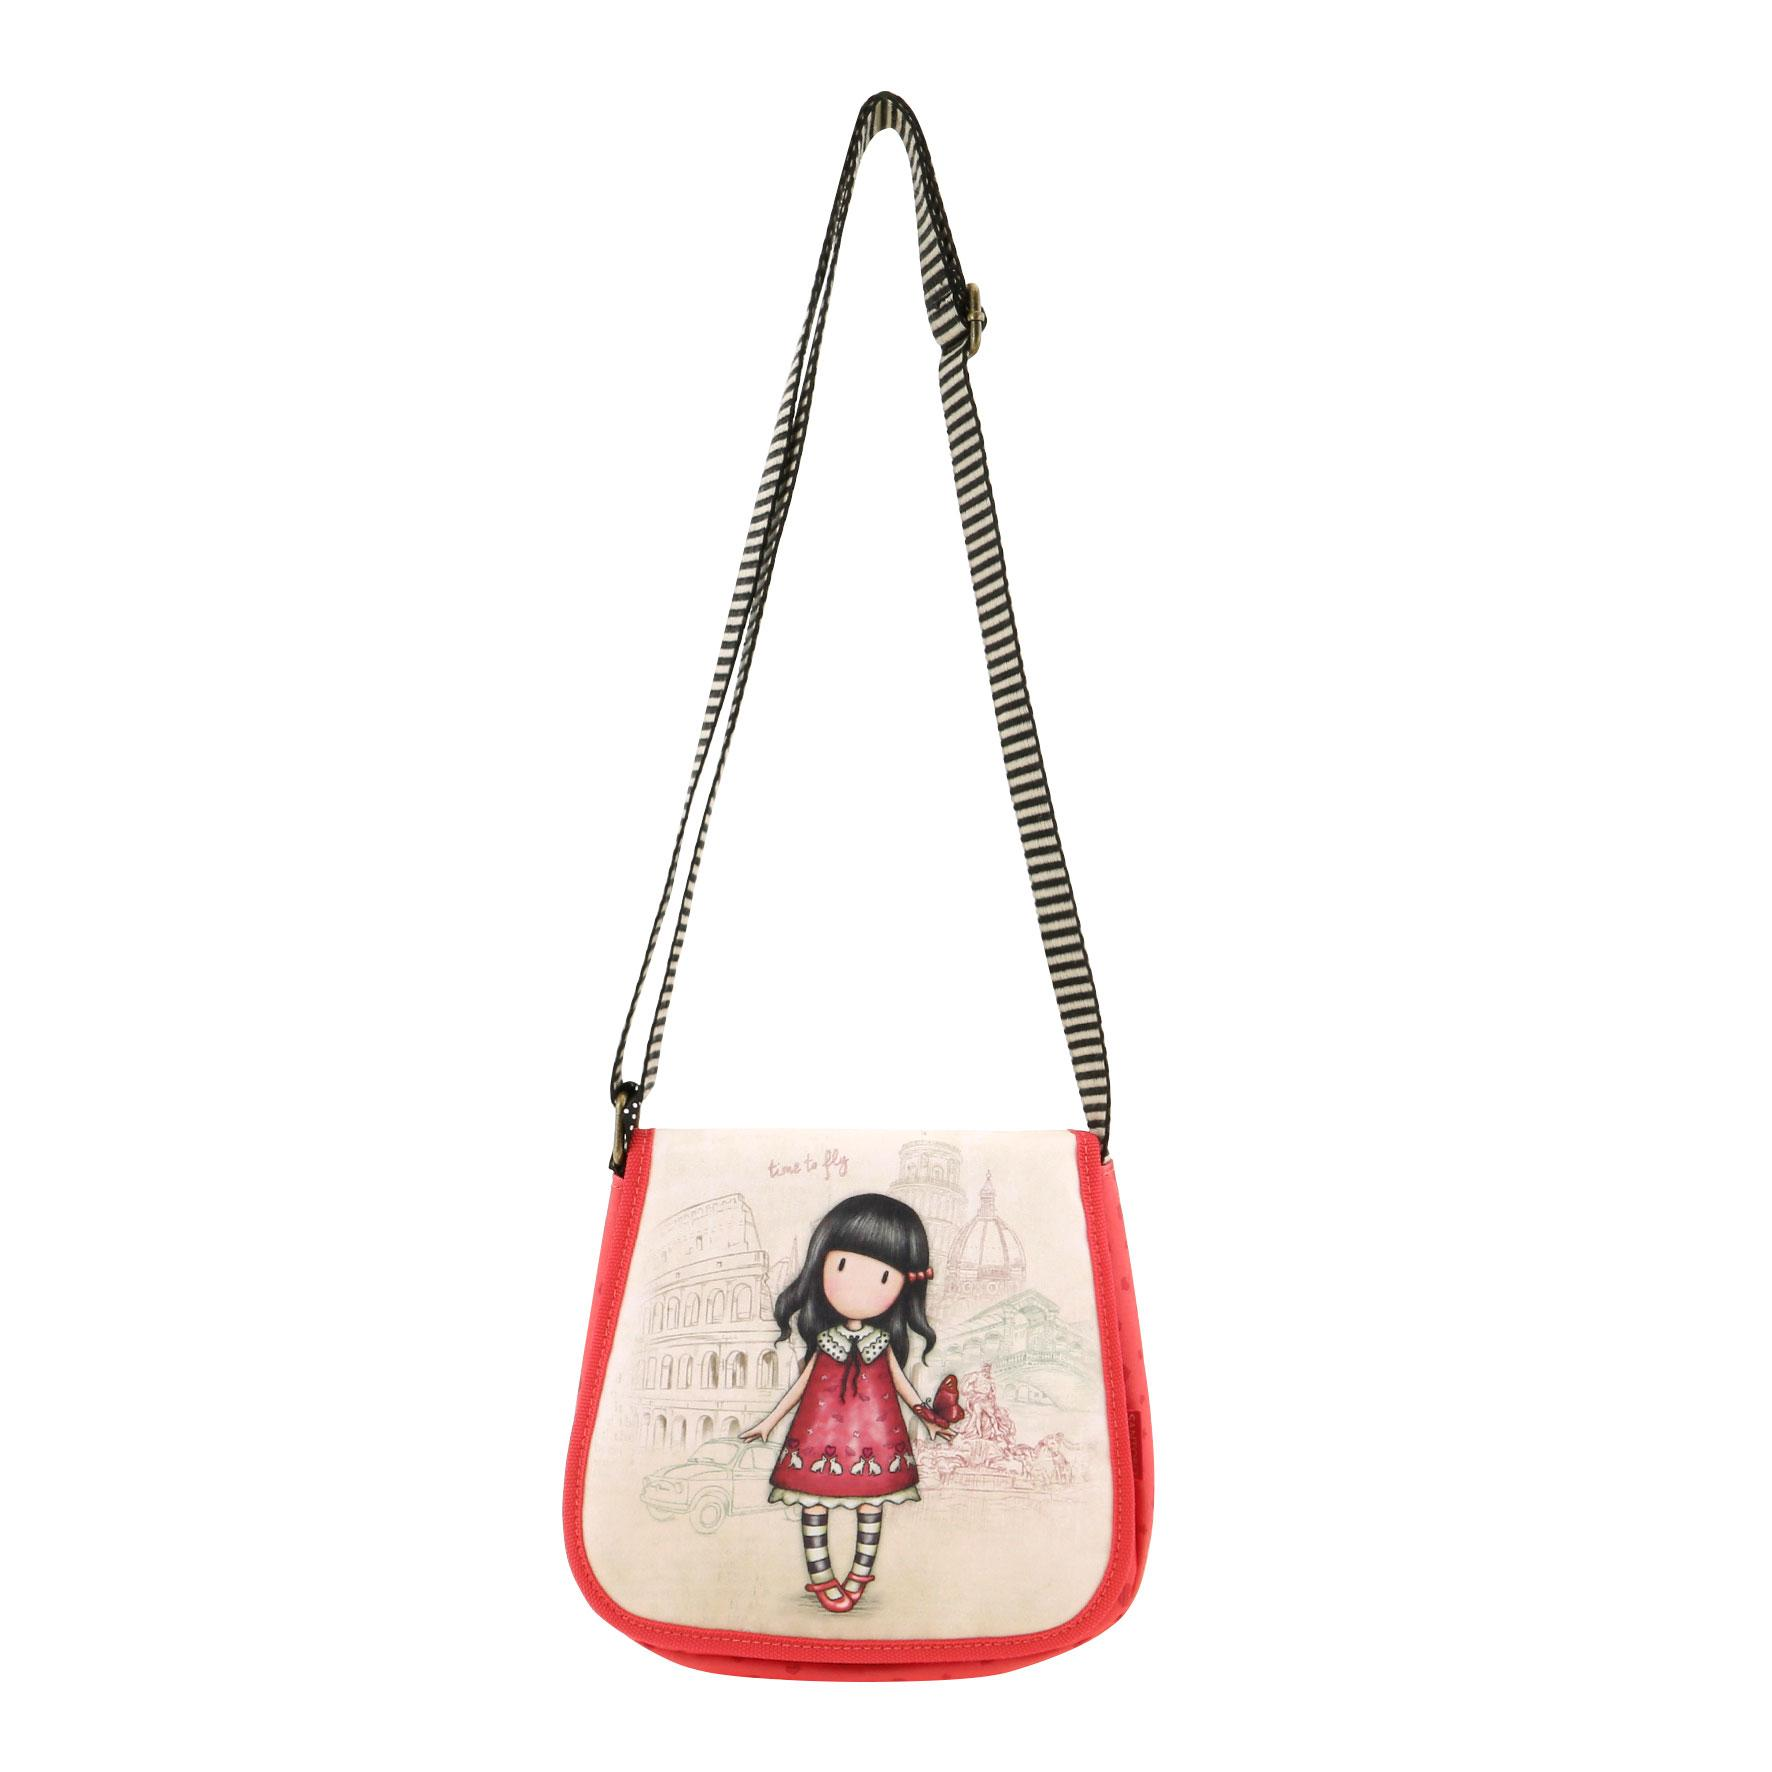 Malá kabelka přes rameno -